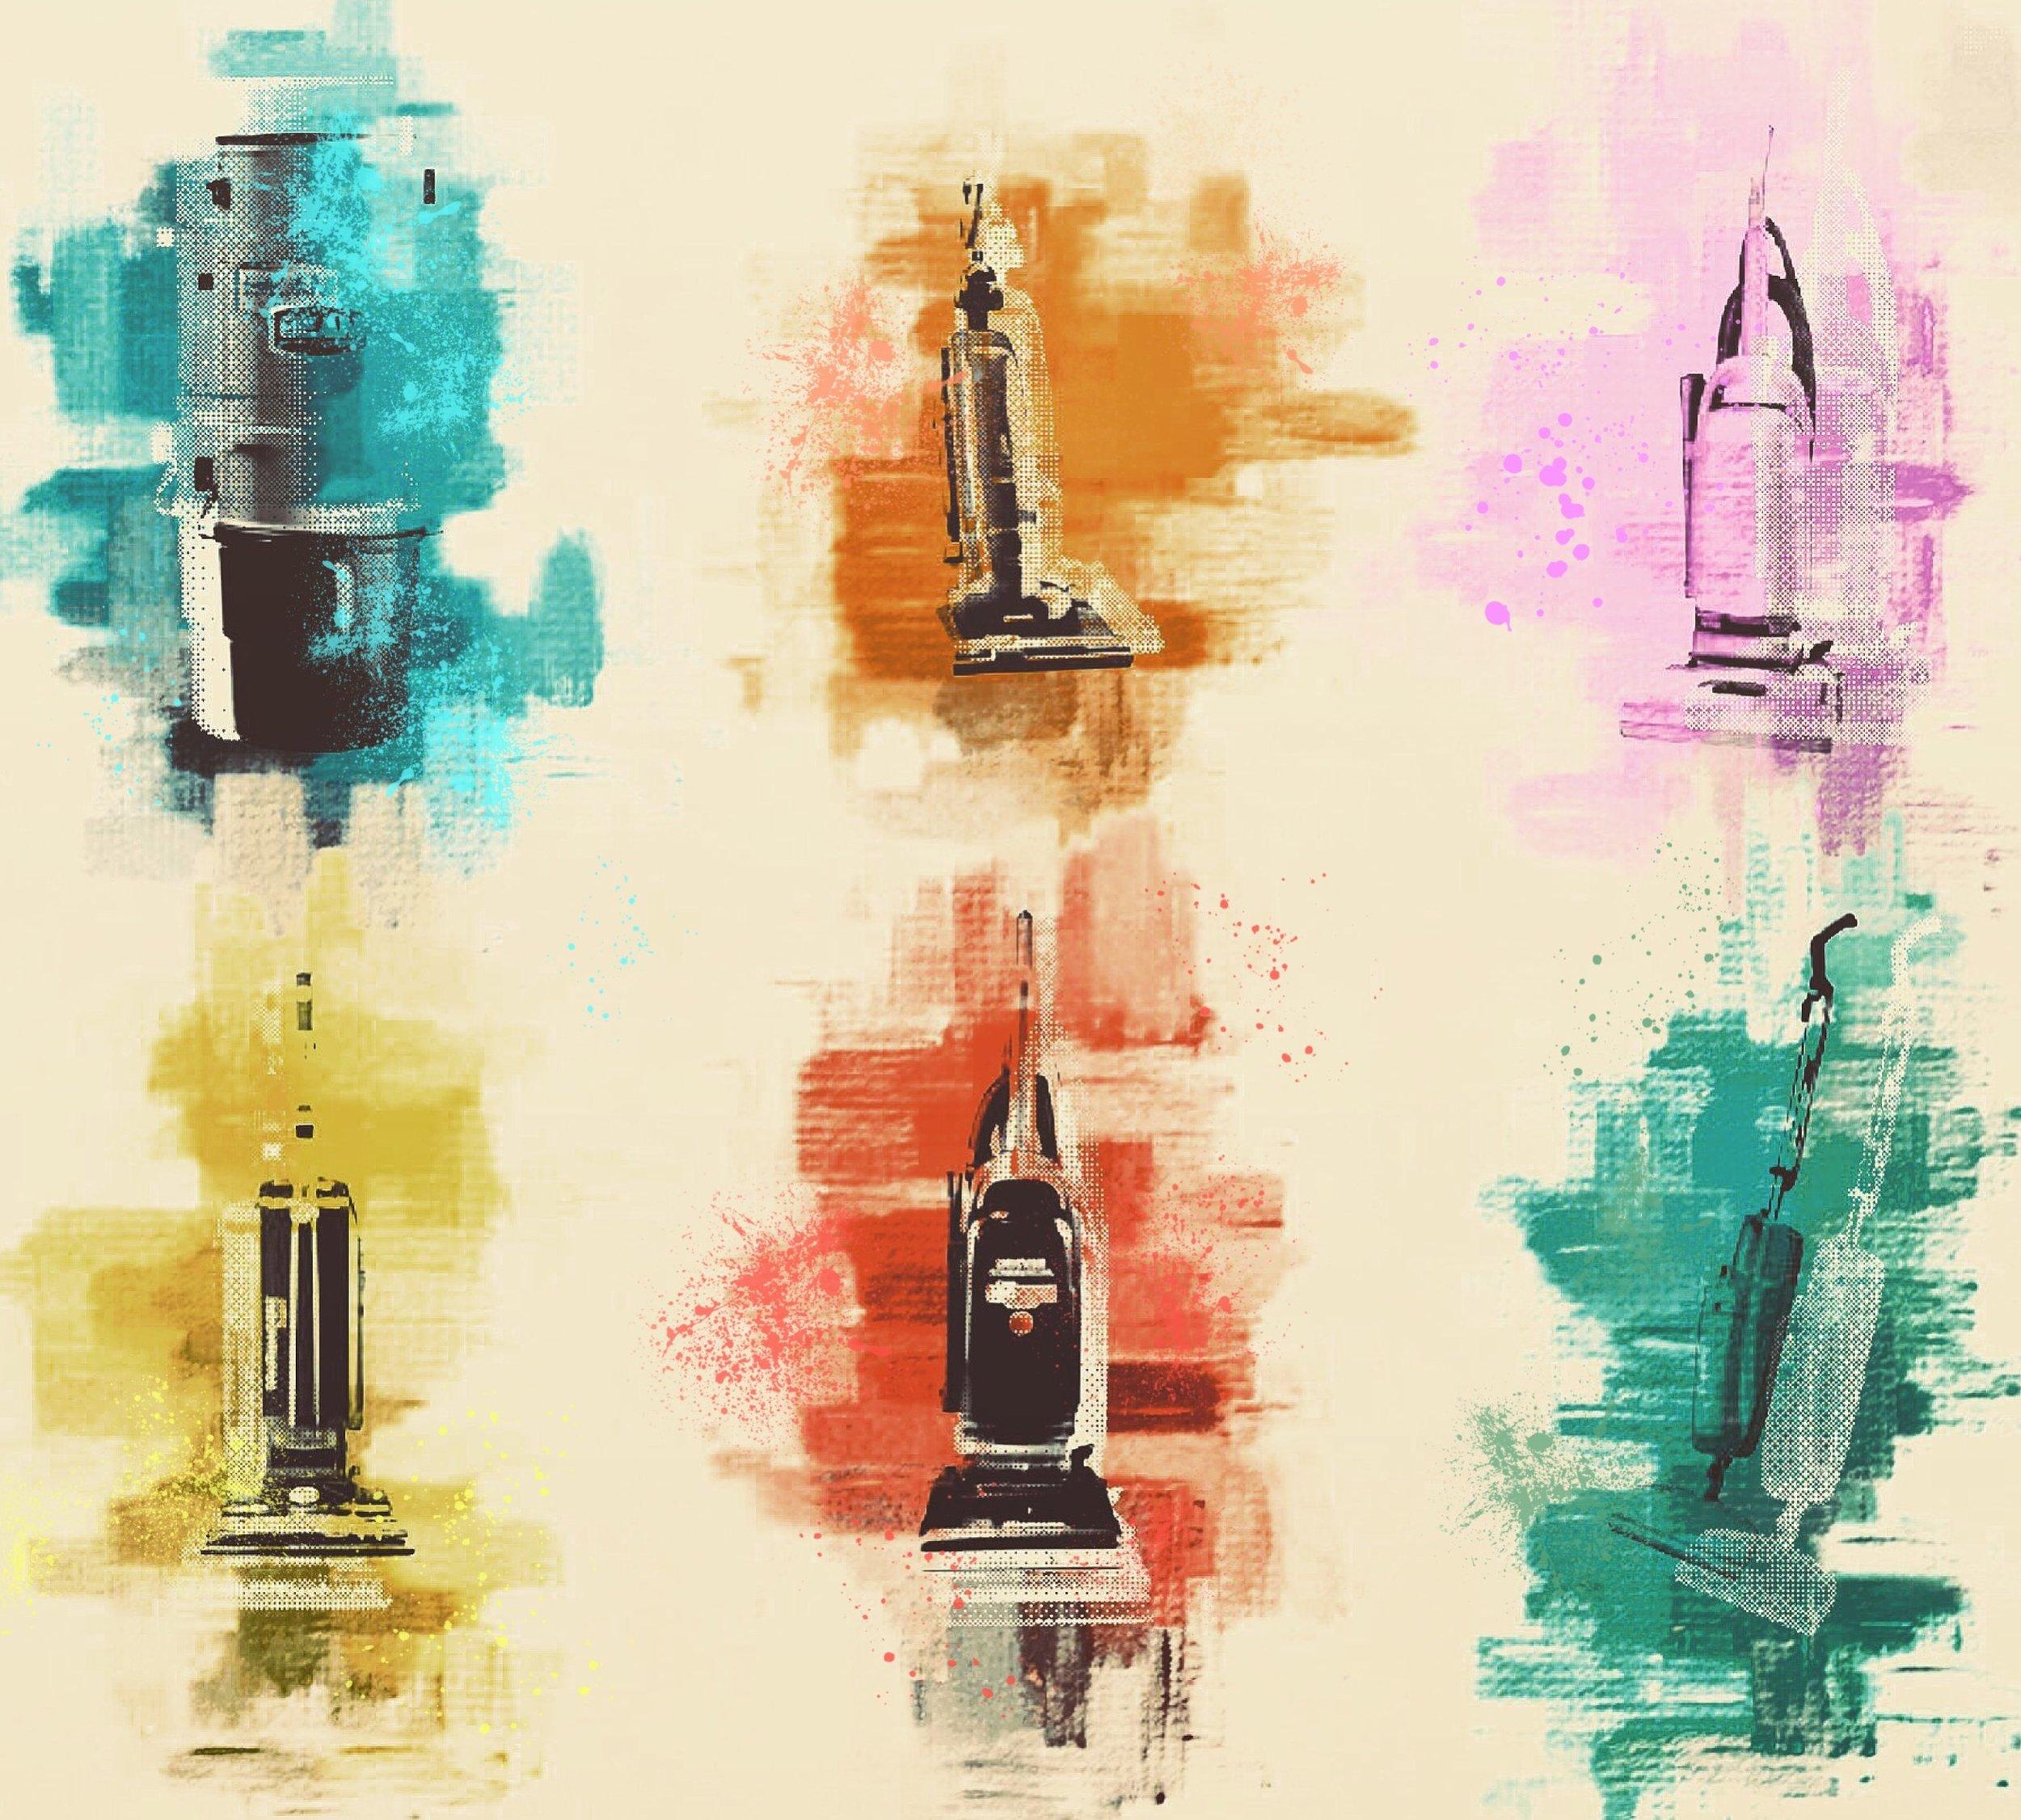 """Vacuums"", iPhone 6S, digital image, 2016"